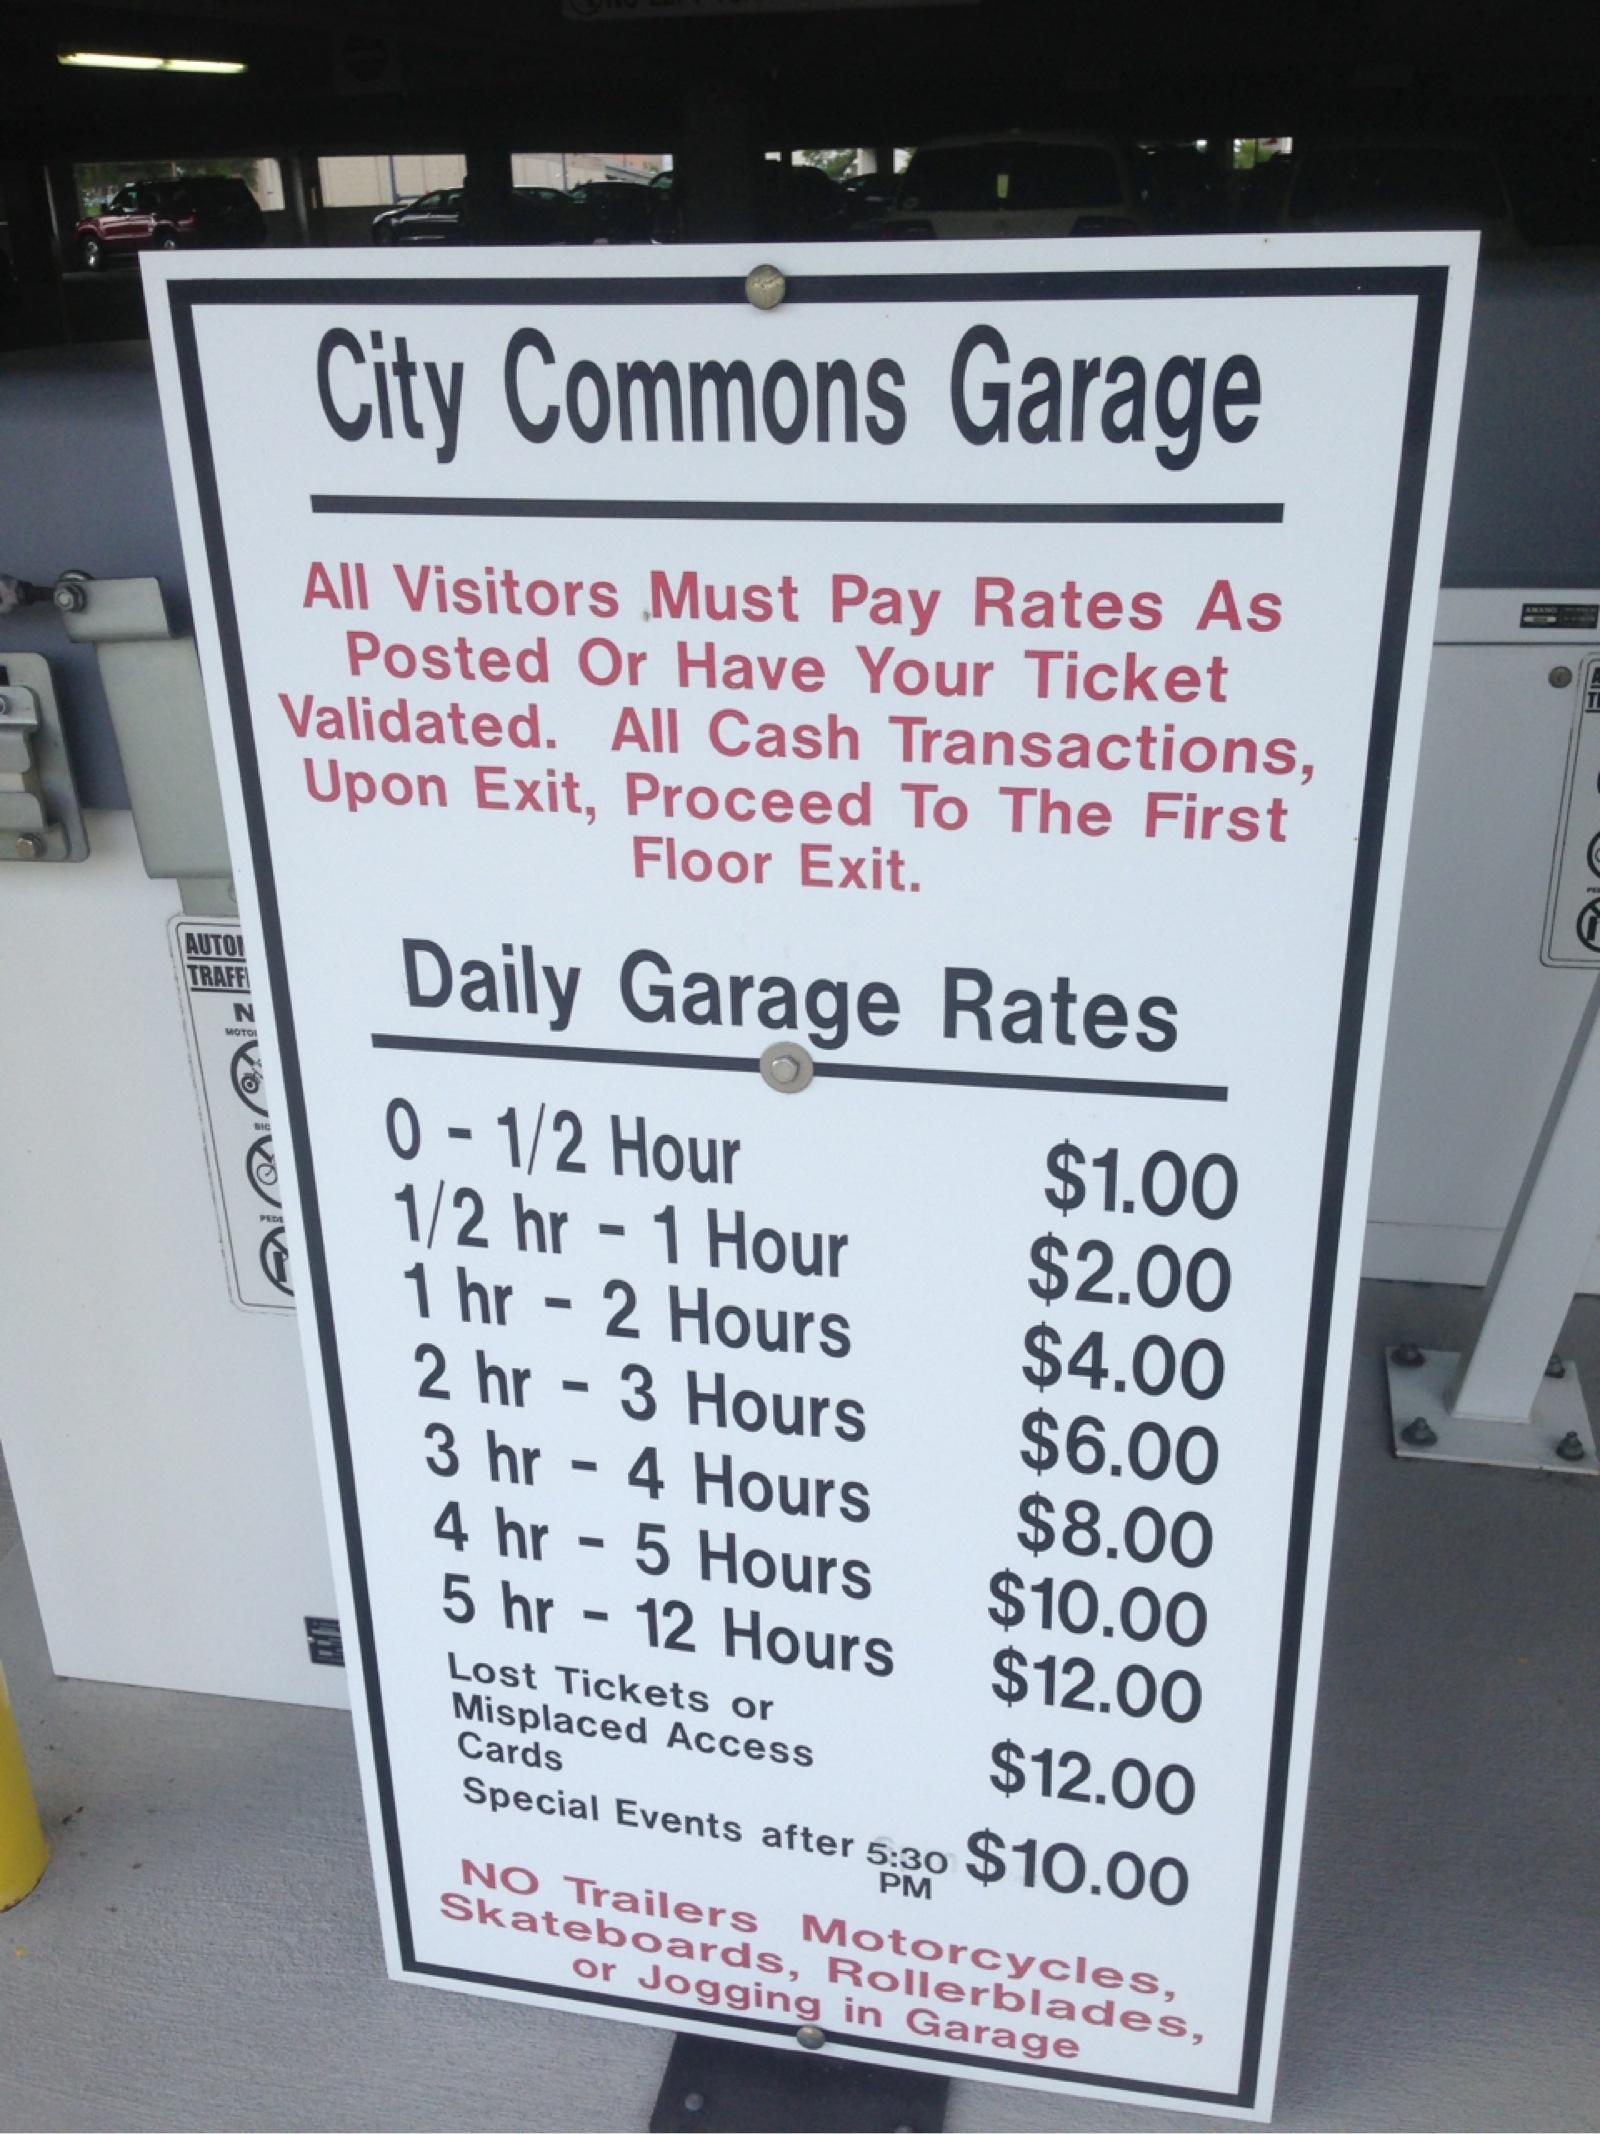 City Commons Parking Garage Orlando Fl